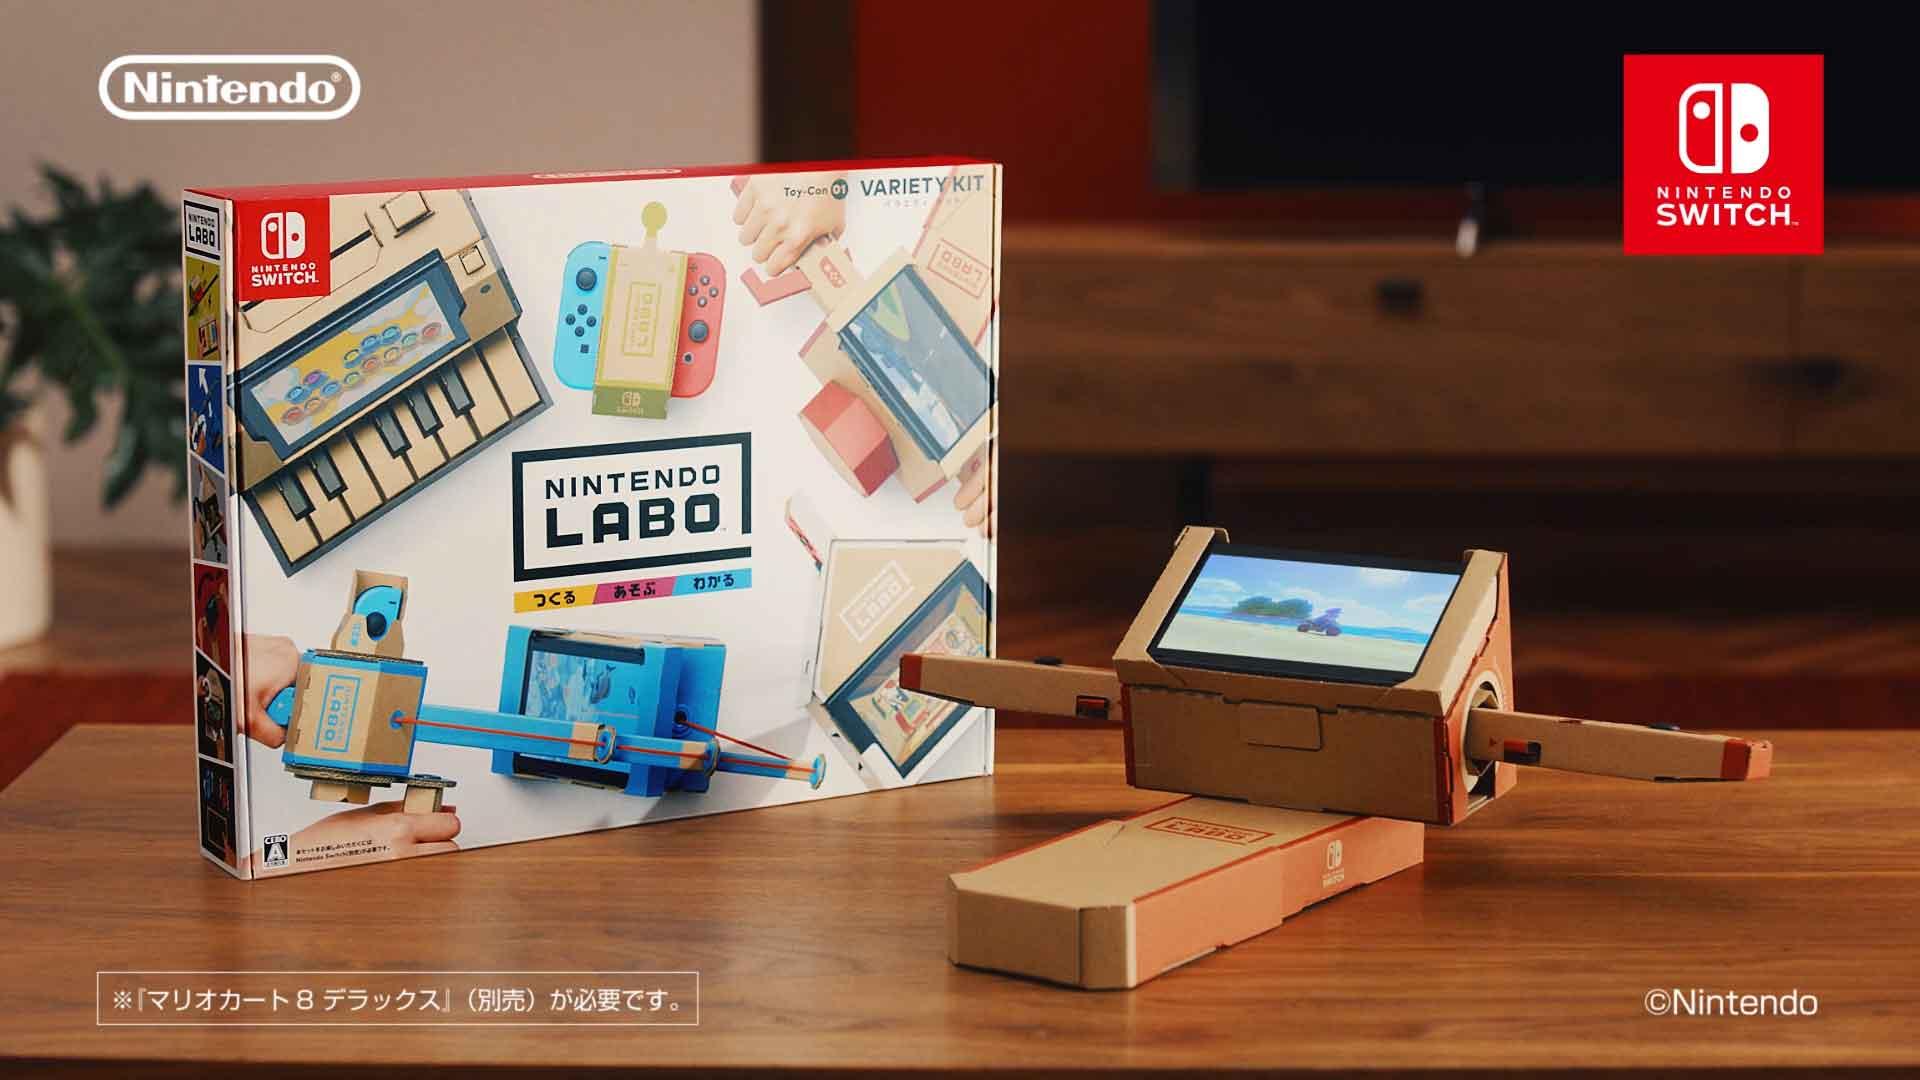 NINTENDO LABO × マリオカート8 デラックス